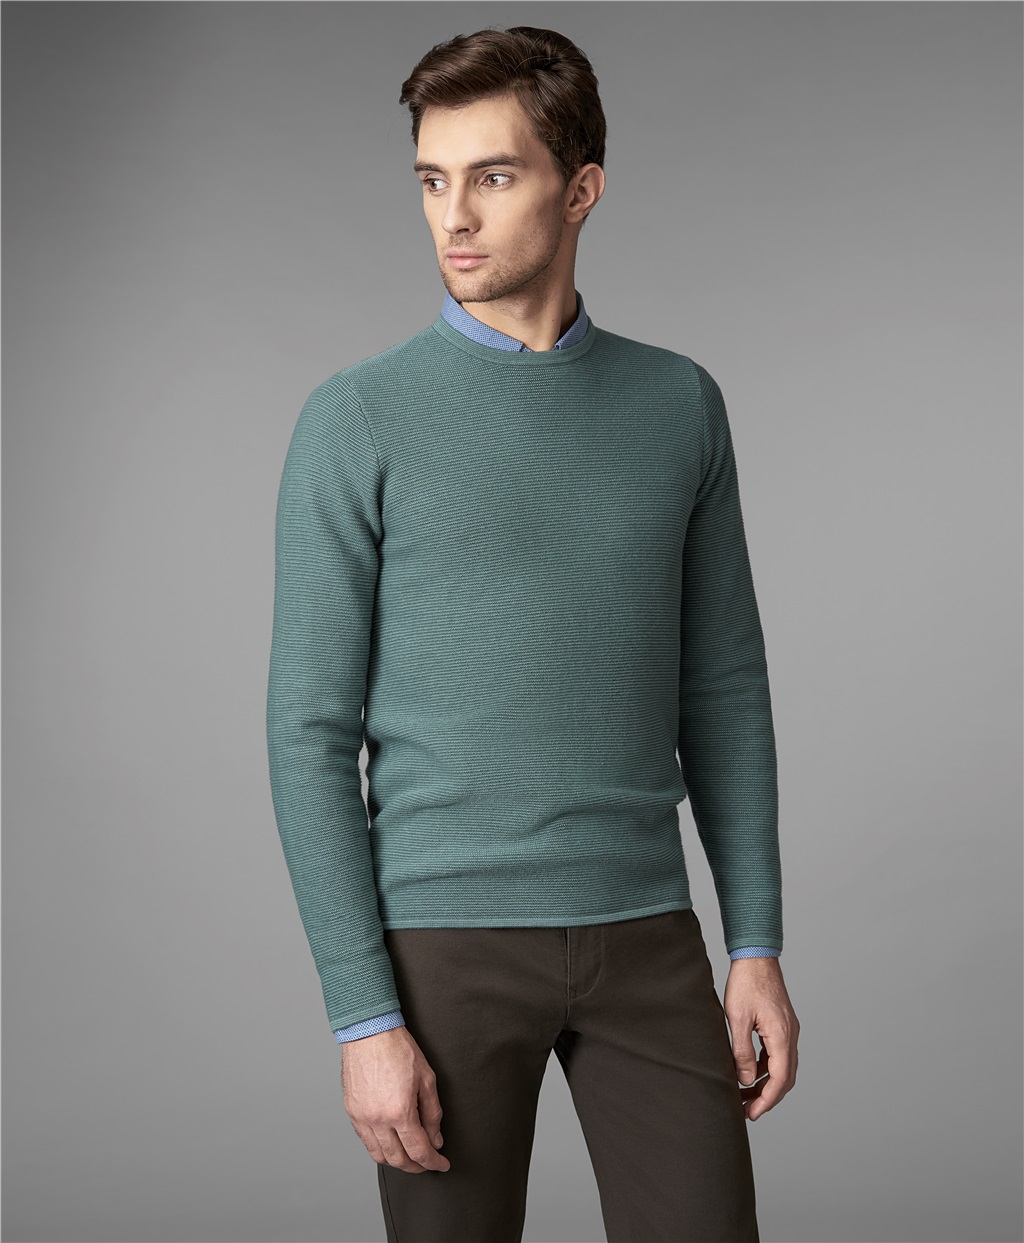 Пуловер мужской HENDERSON KWL-0685-1 зеленый 48 RU фото